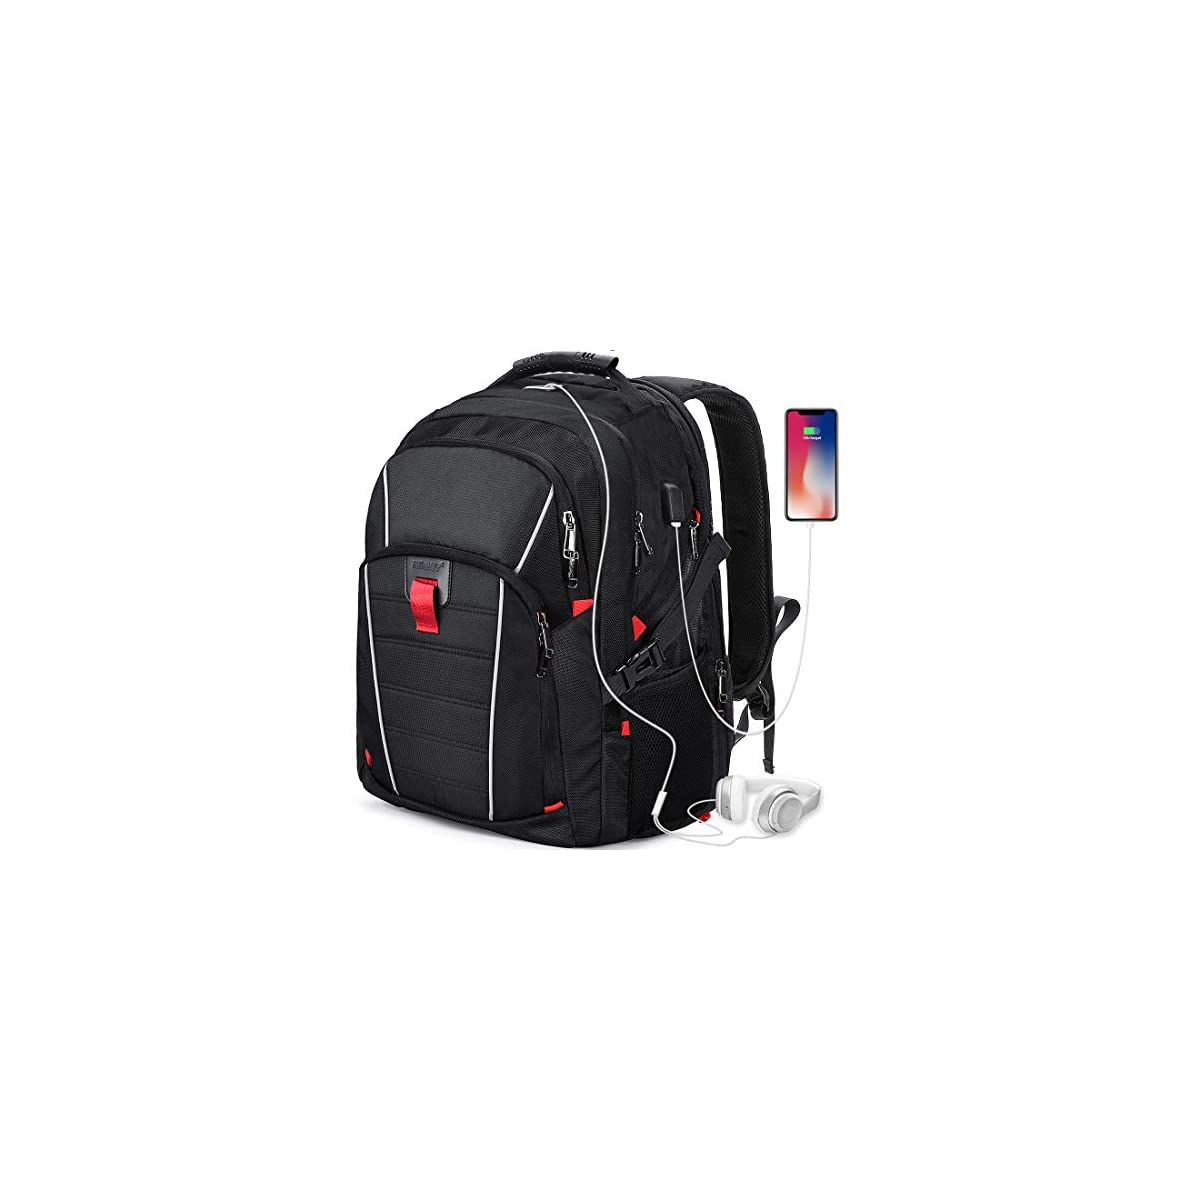 51LZWN2jdLL. SS1200  - Mochila Portátil Hombre 17.3 Pulgadas Puerto USB Impermeable Trabajo Ordenador Viaje Negocio Multifuncional Daypacks Negro